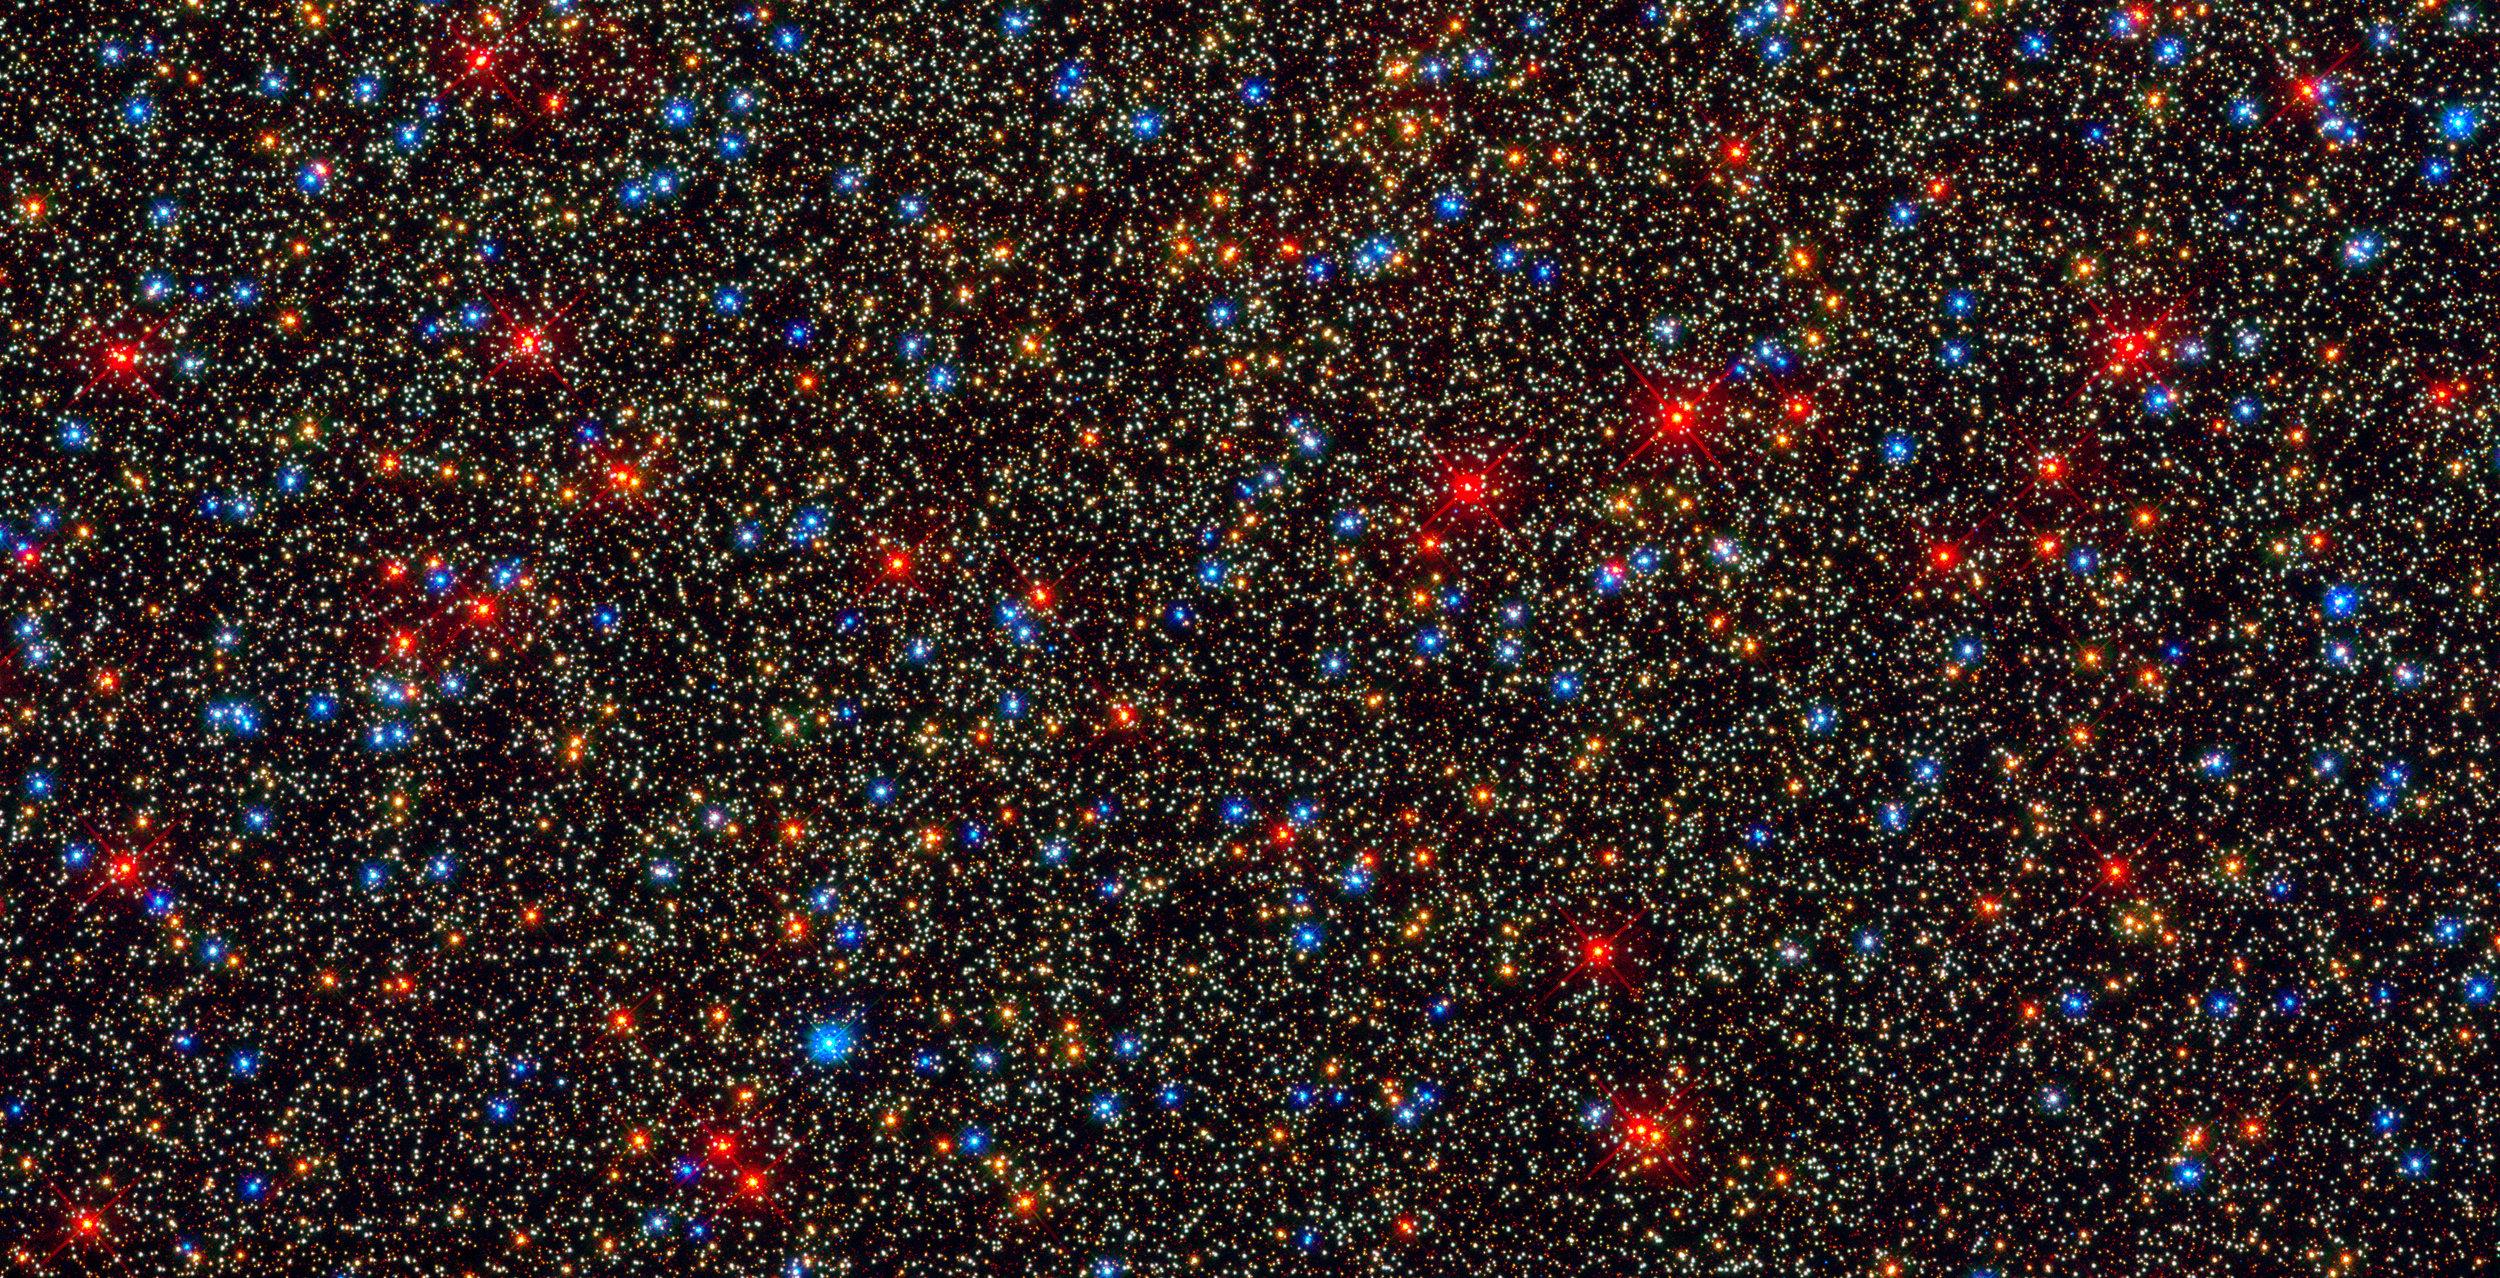 Image Credit: NASA/ESA Hubble Space Telescope